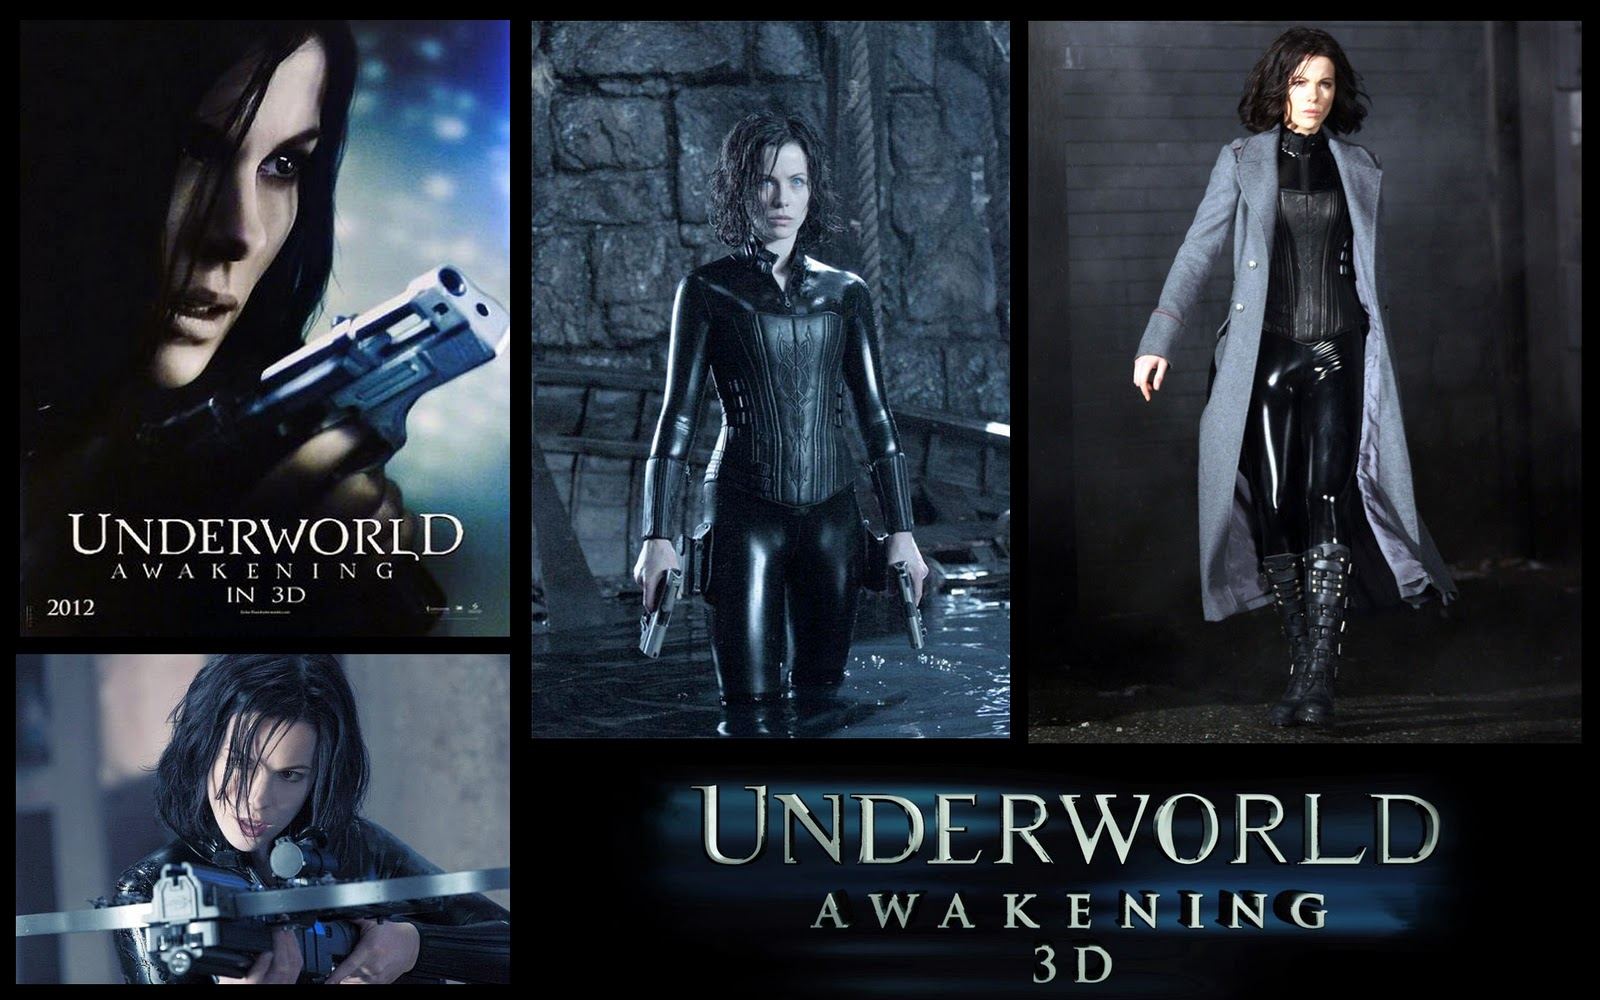 http://1.bp.blogspot.com/-CFTI2cQnUB8/TrAqsTnLxsI/AAAAAAAADCk/4B3NweEj2M4/s1600/Underworld+Awakening+Wallpaper+kate+Beckinsale.jpg